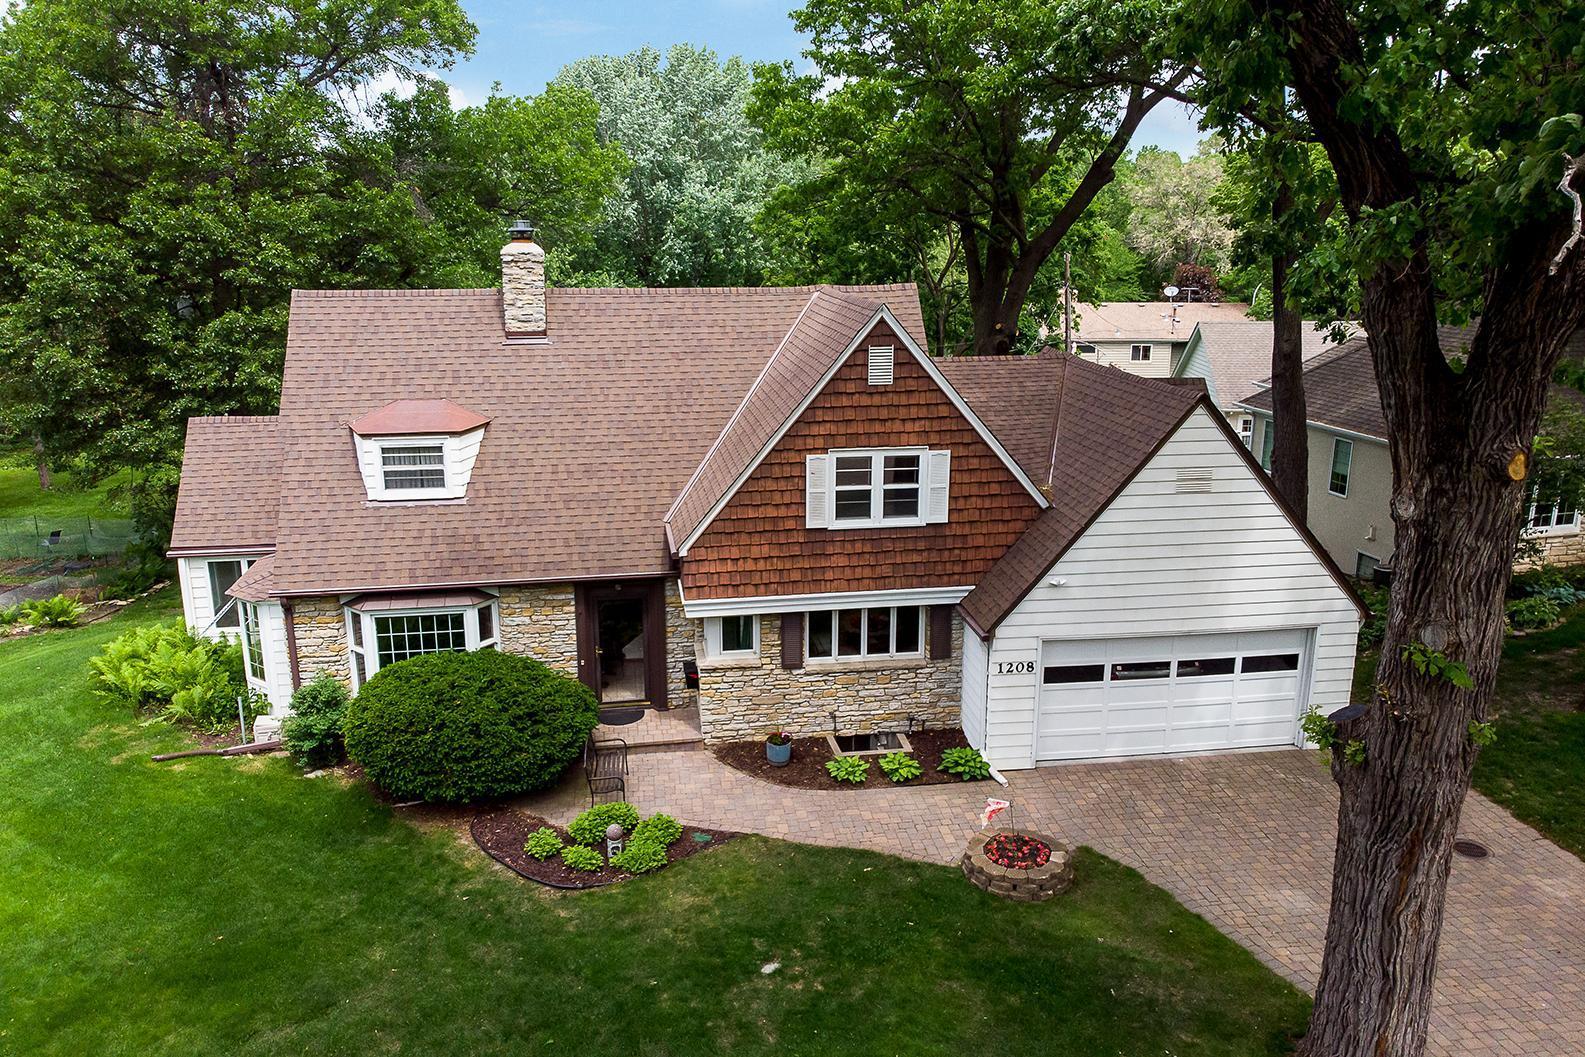 1208 W 73rd Street Property Photo - Richfield, MN real estate listing